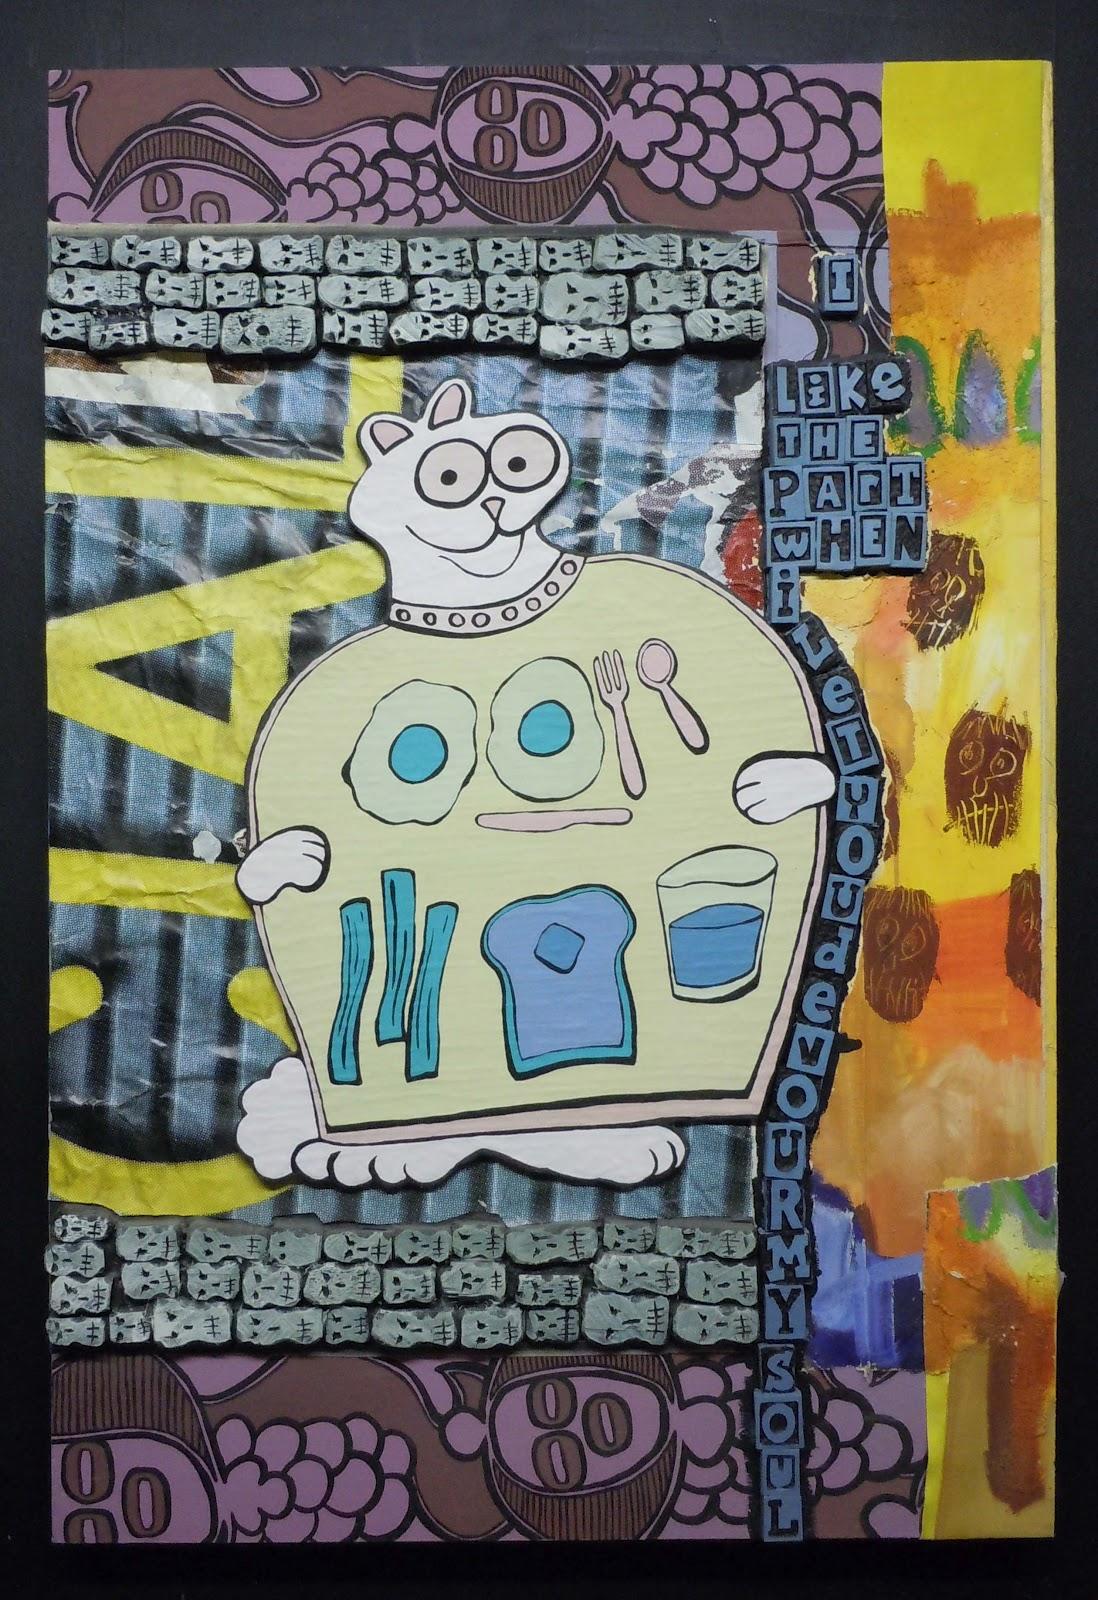 http://2.bp.blogspot.com/-3yHABJYMrZ0/T3KqHbLINAI/AAAAAAAAAUI/rEyYhqVhUzc/s1600/Steve+Banks+Art+Halcyon+Days+of+Yore+2012.jpg